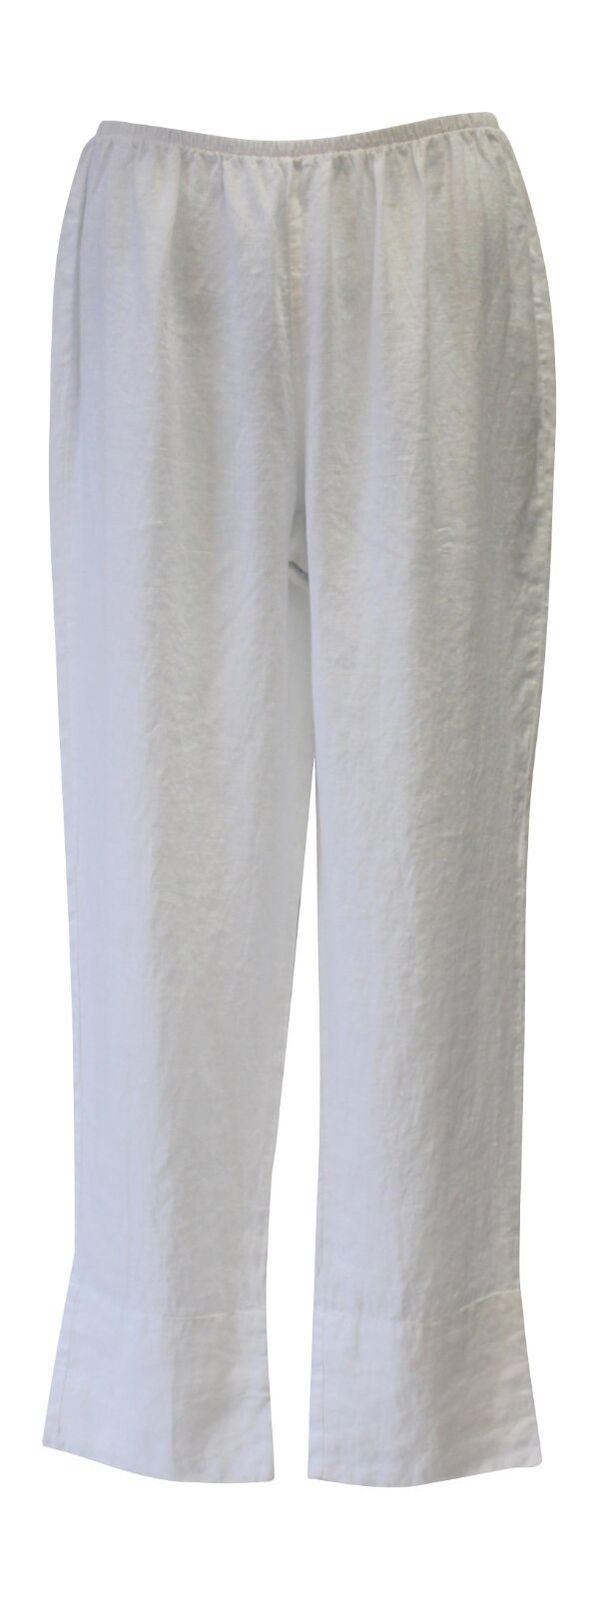 Flax Designs  Relaxed Roll-Up Pant   NWT  Weiß Linen  Größe  Medium